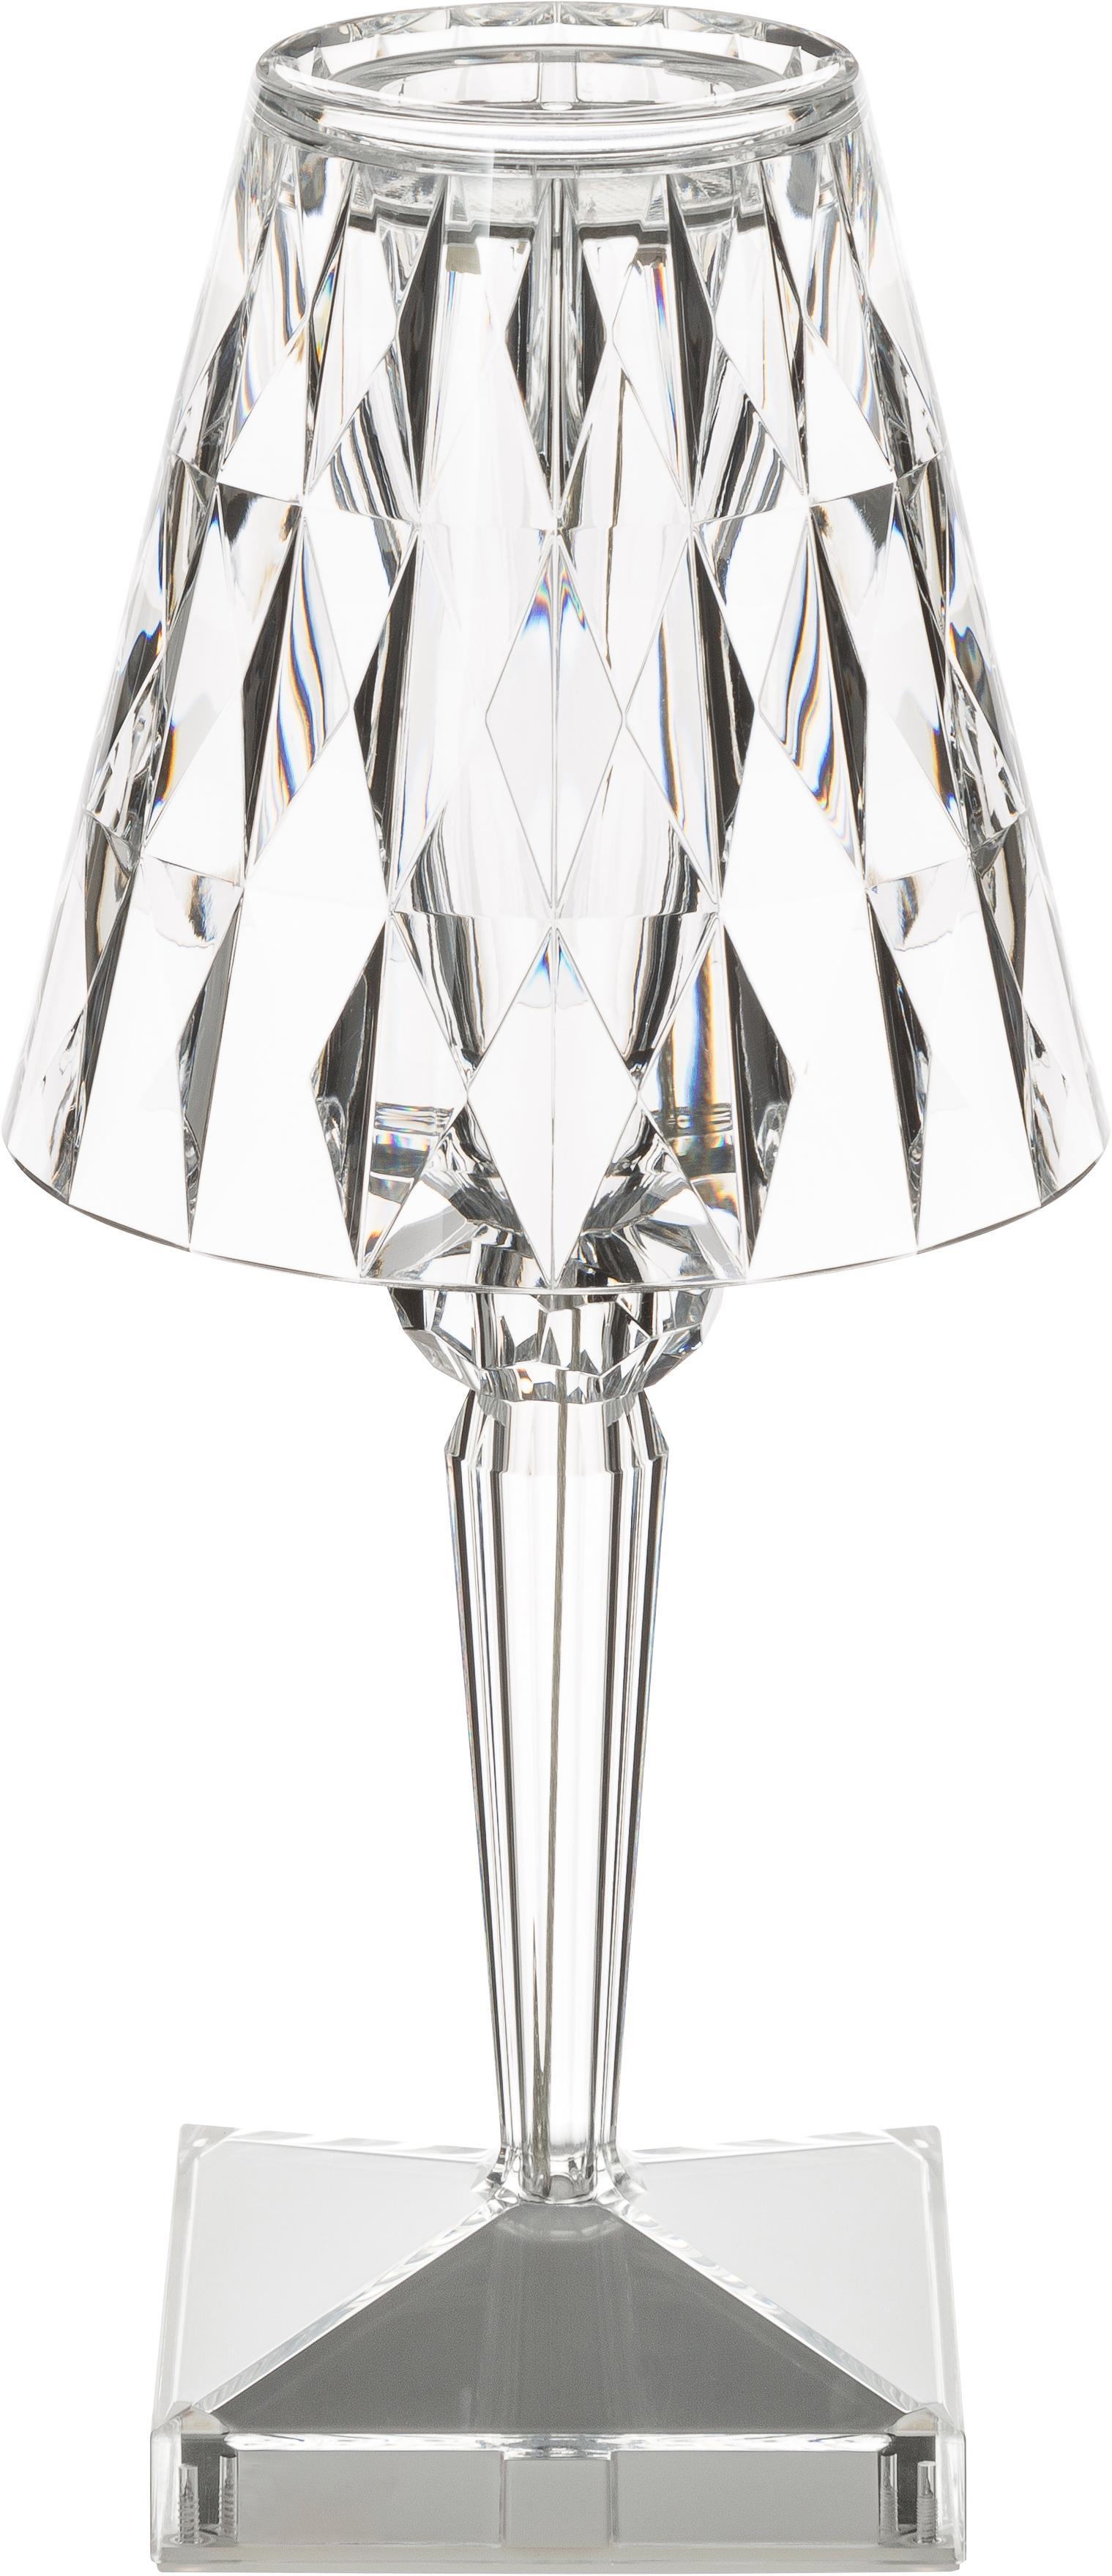 Lampada da tavolo a LED Battery, Materiale sintetico, Trasparente, L 12 x Alt. 26 cm